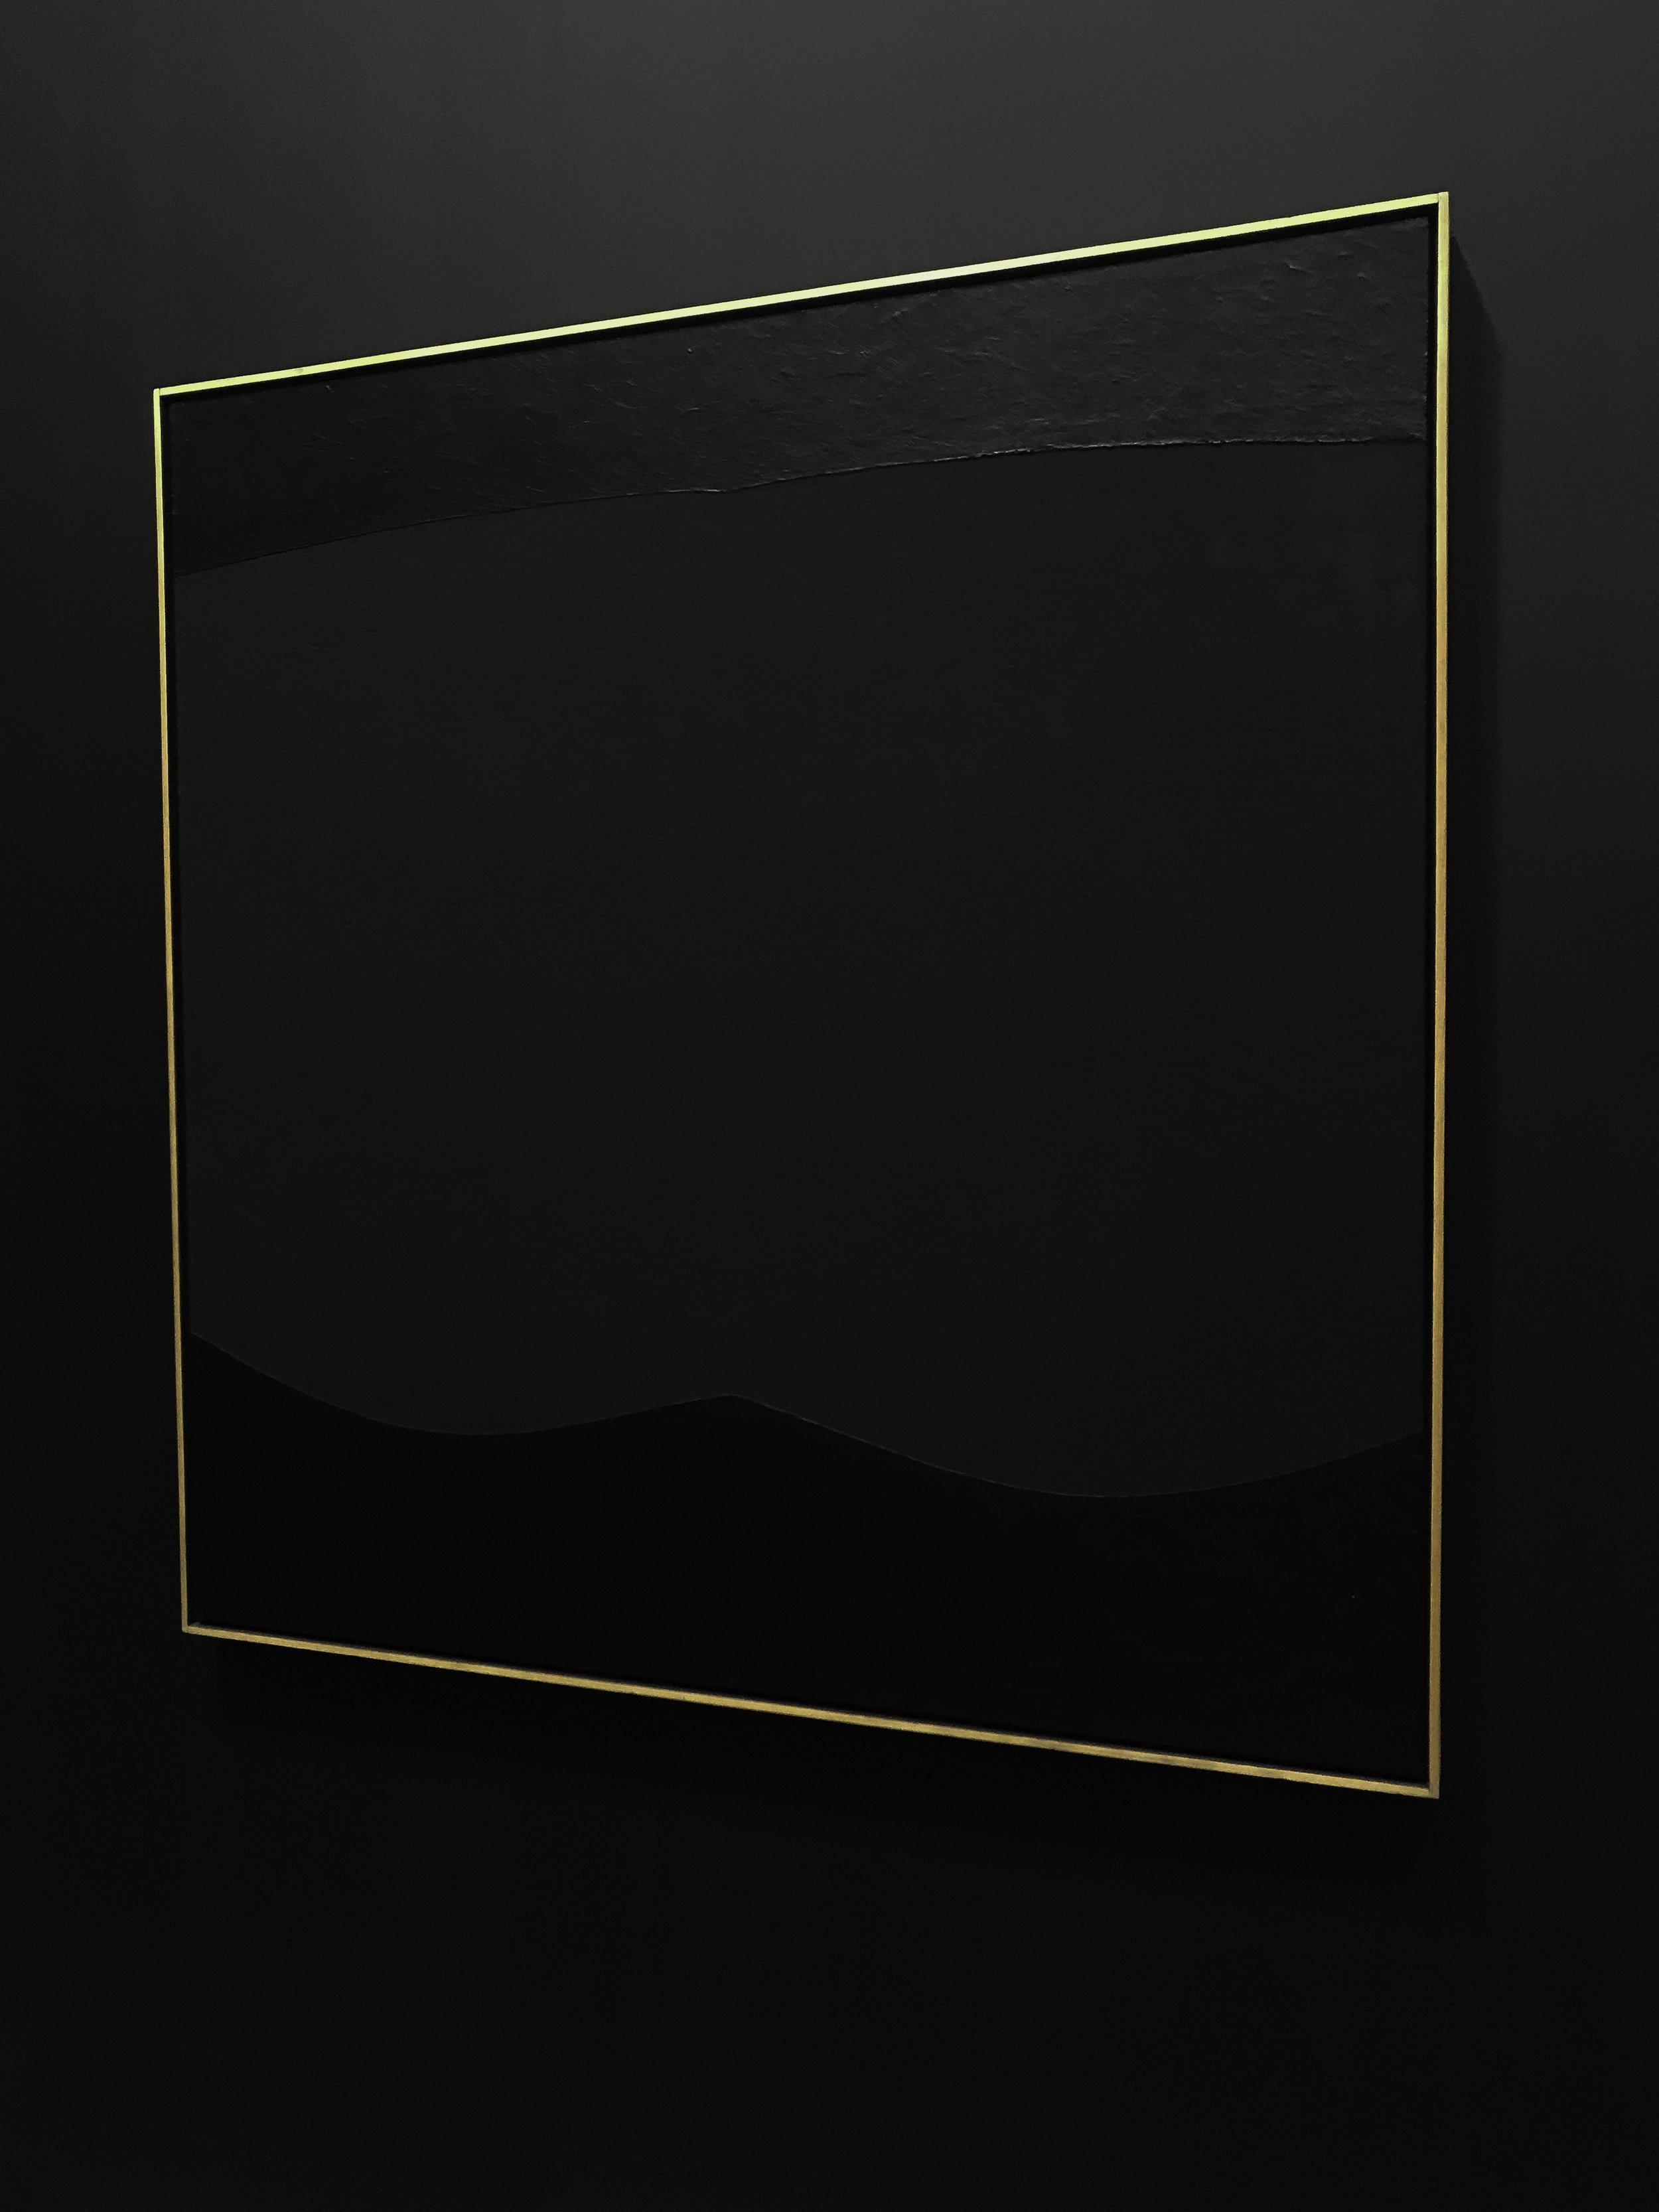 Alberto Burri,  Nero Cellotex , 1975 - 1987 Acrylic and vinavil on celotex